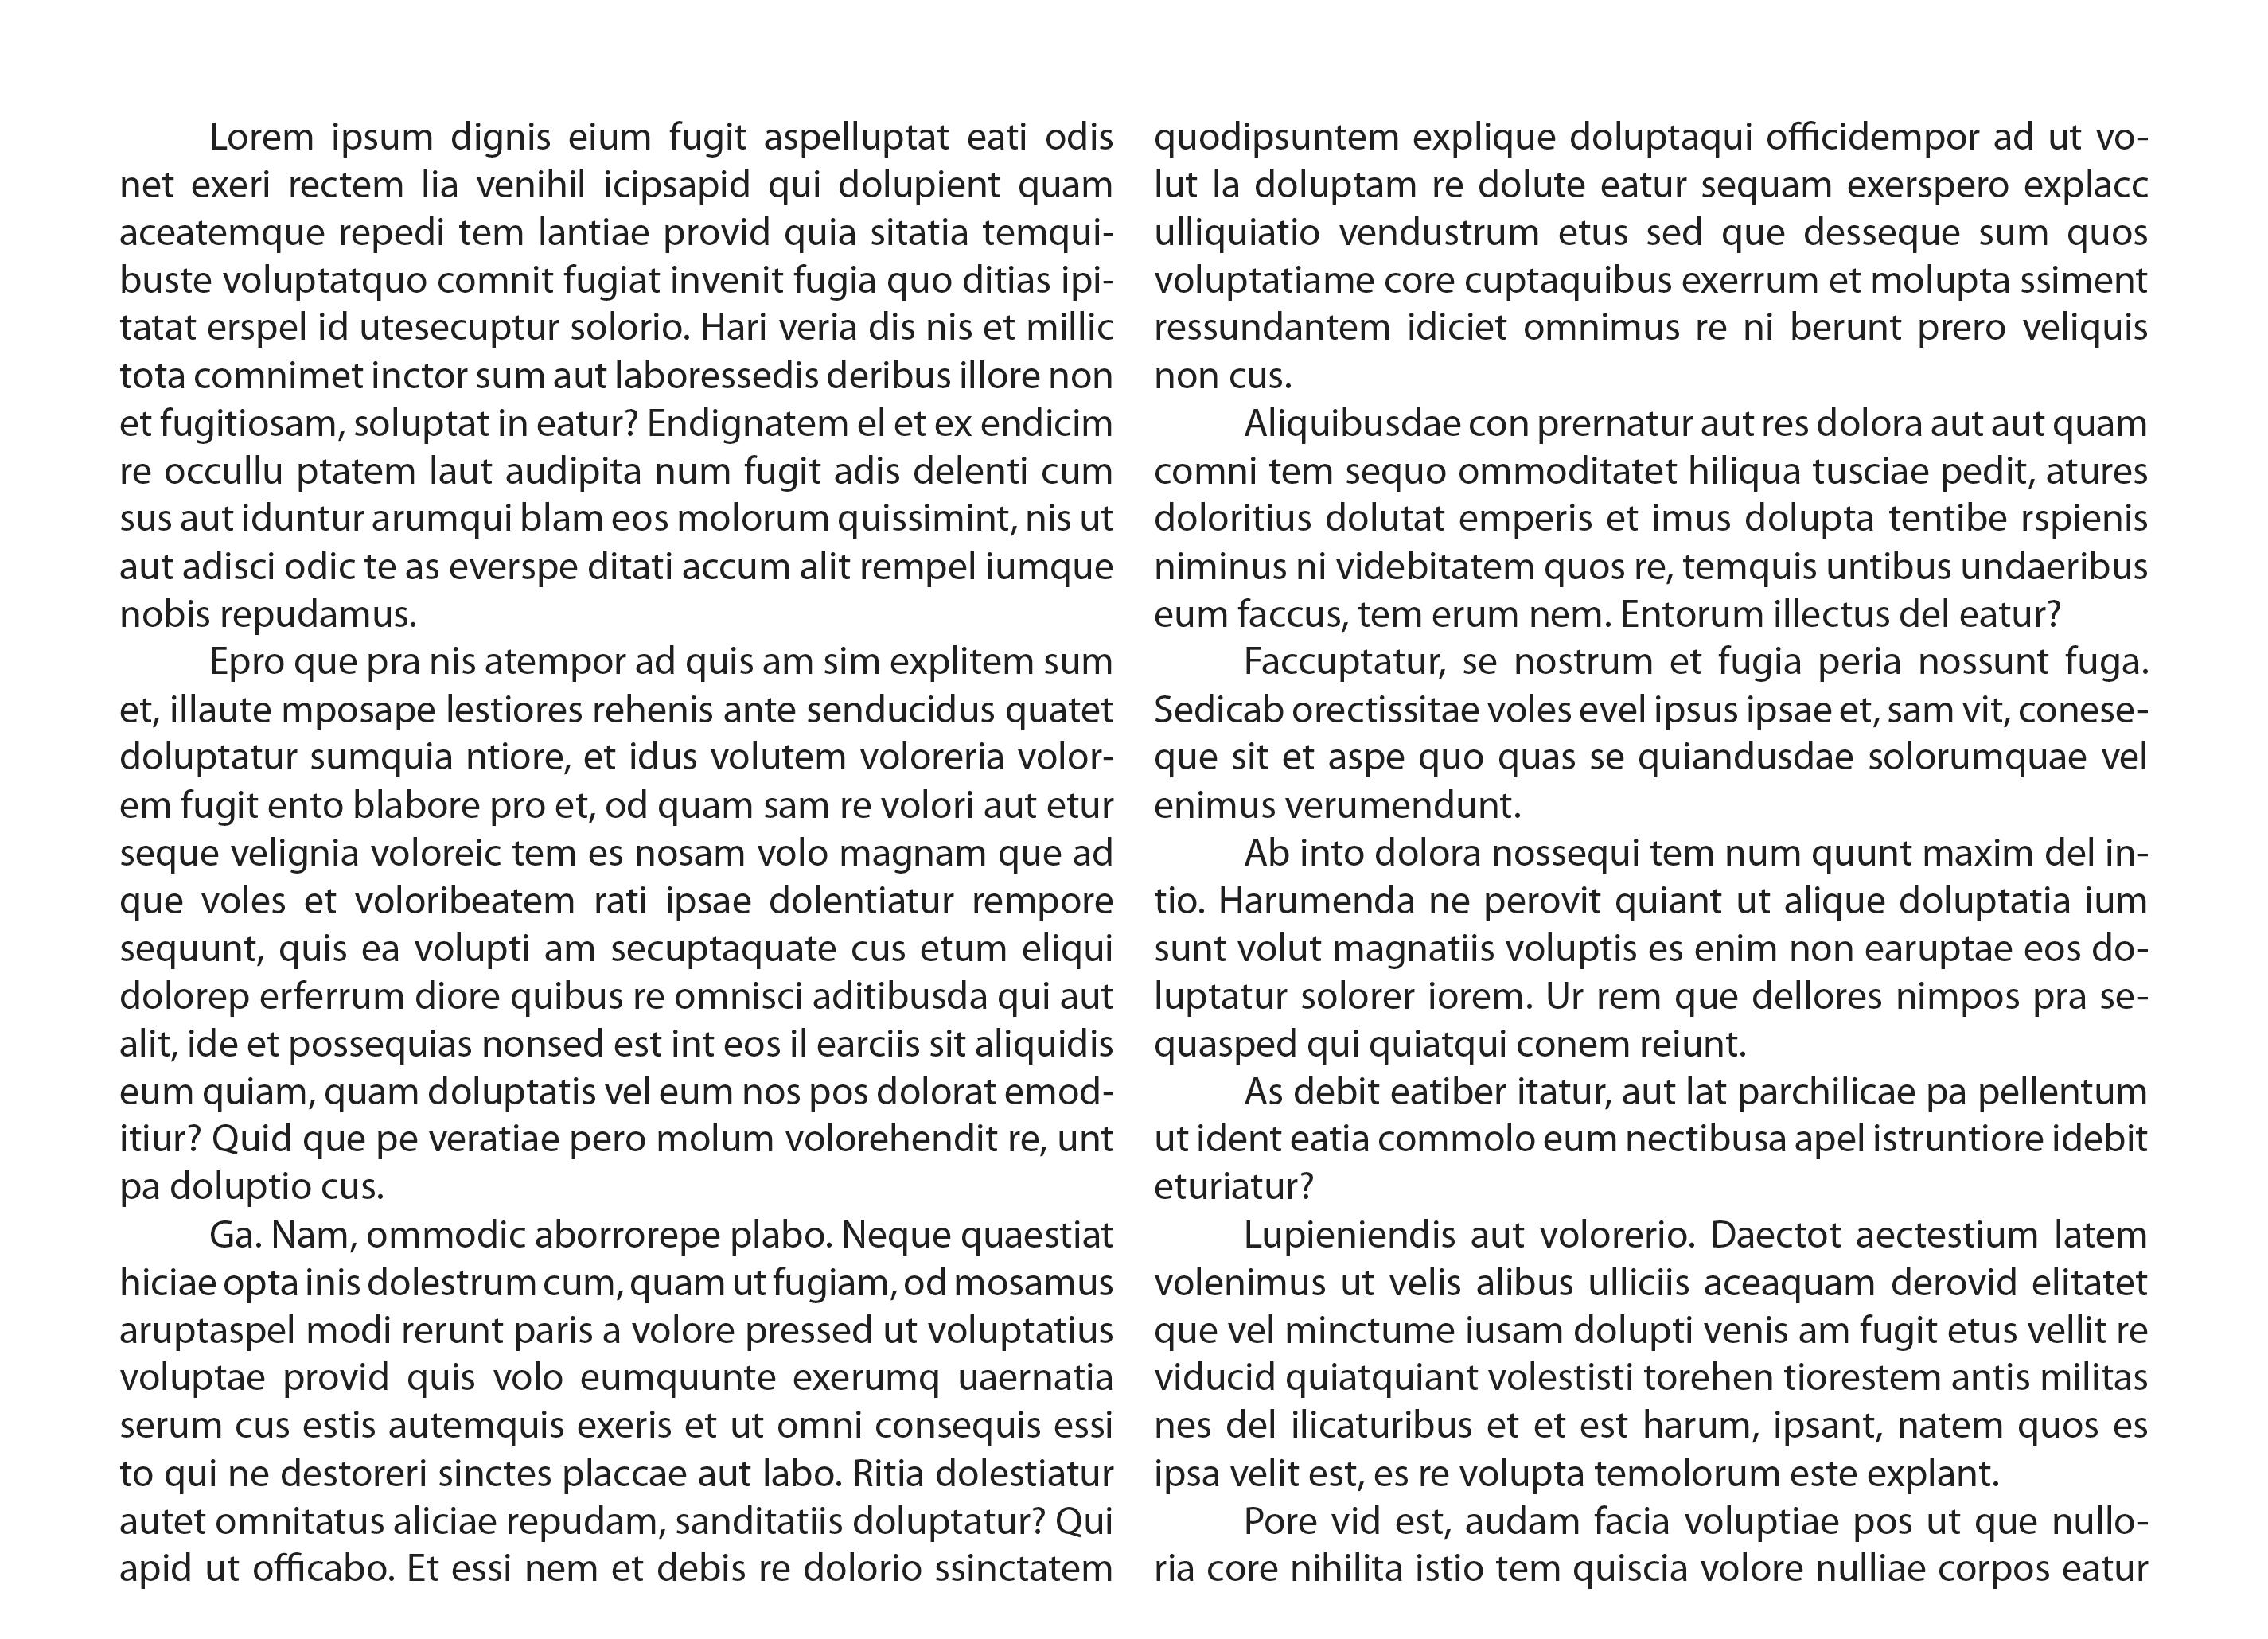 Sample pdf.